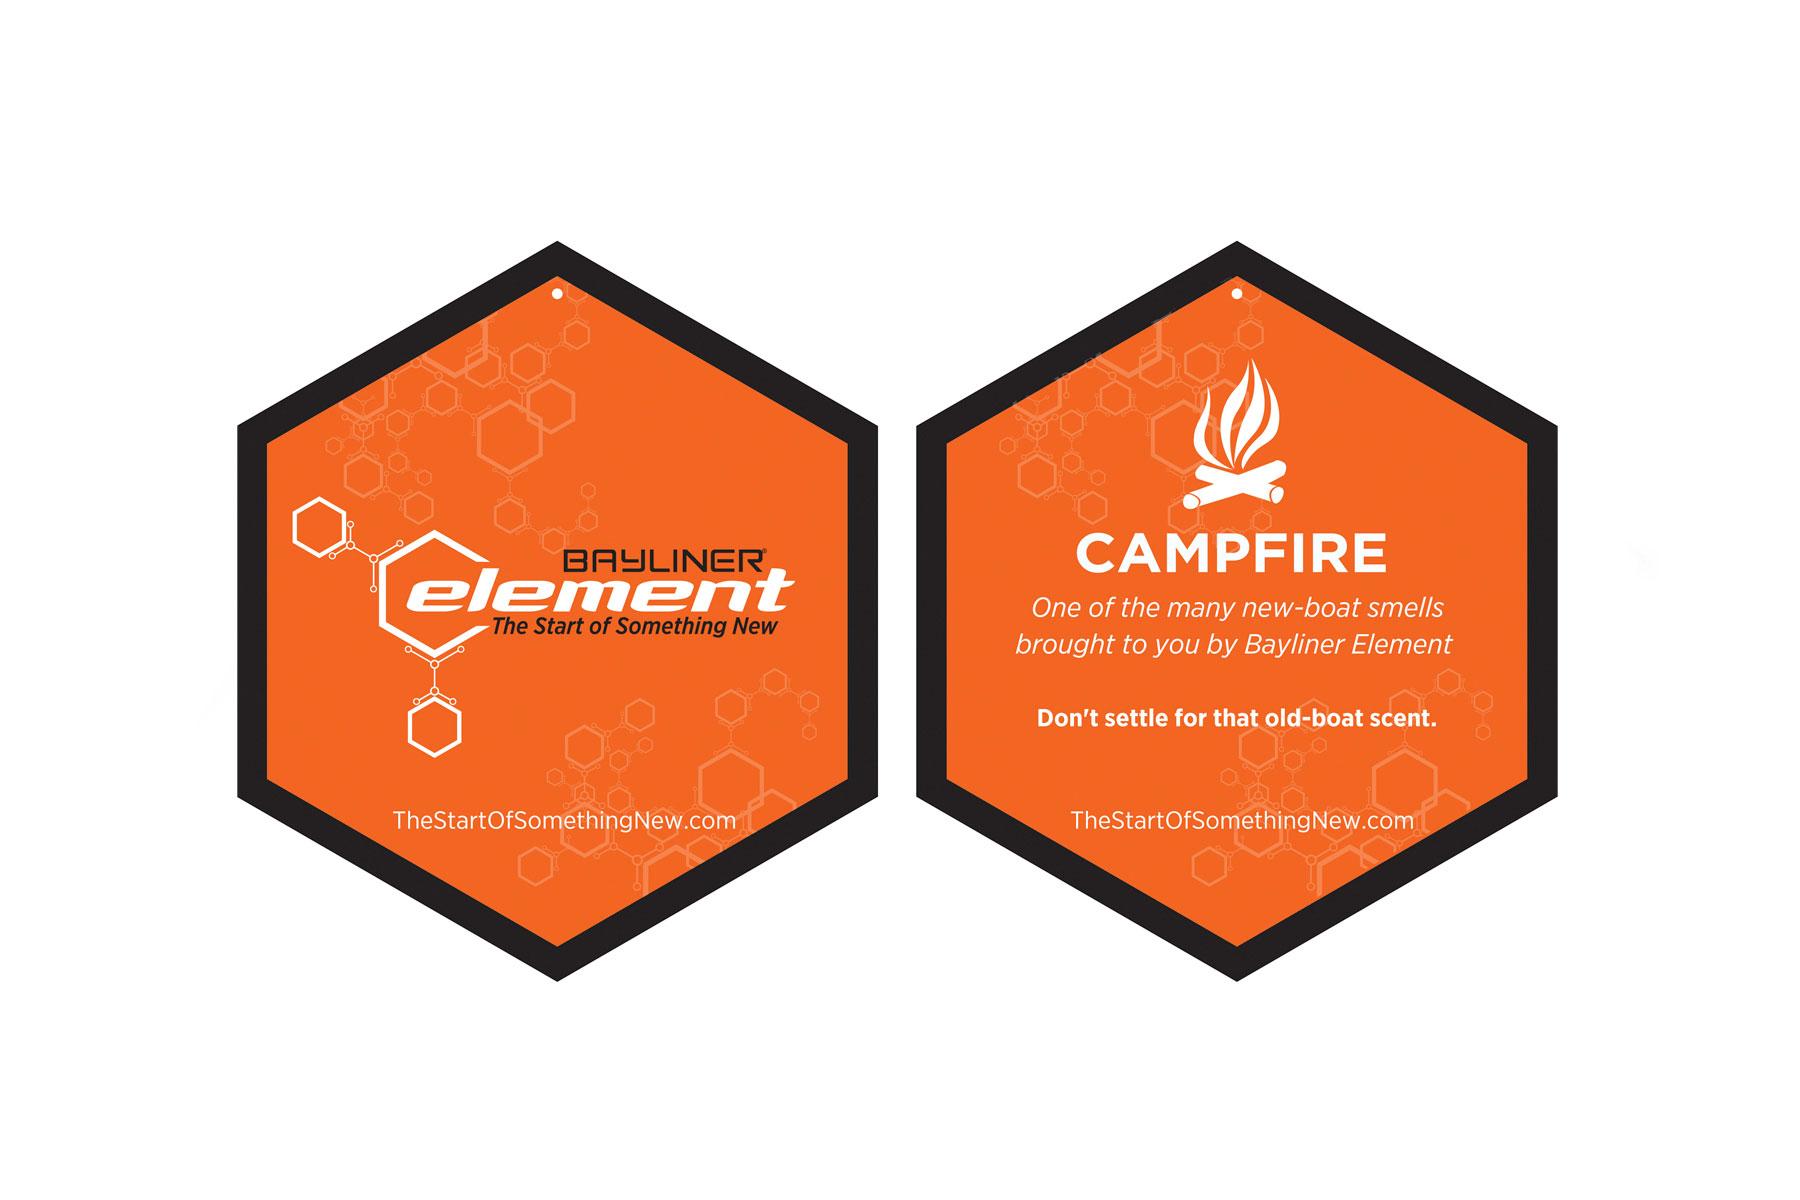 Bayliner Element campfire-scented air freshener